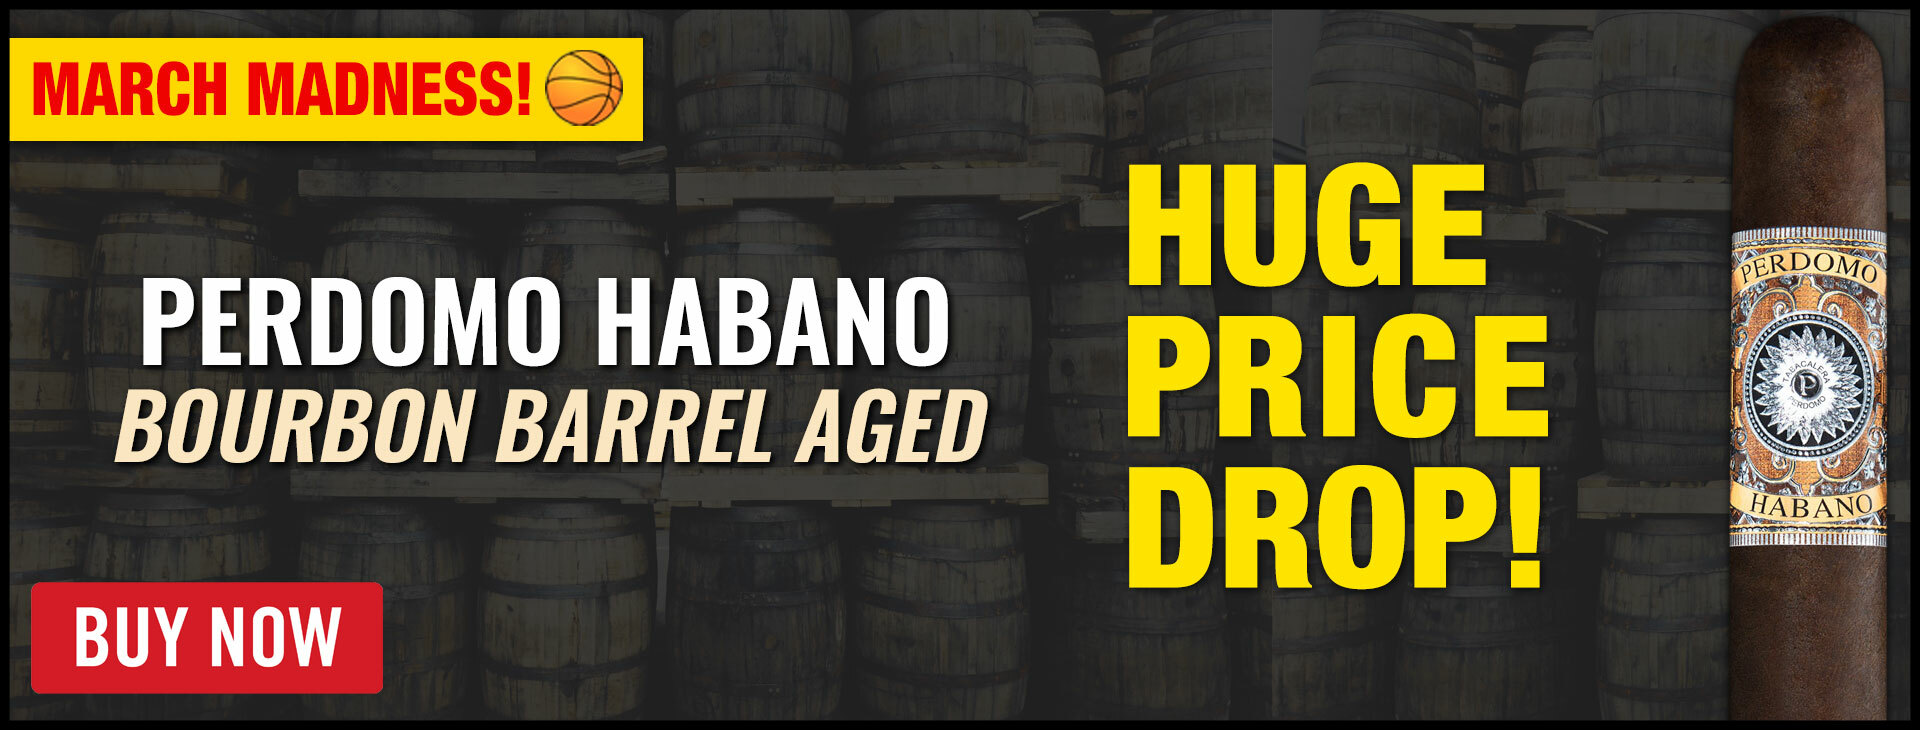 Perdomo Habano Bourbon Barrel Aged DEAL!